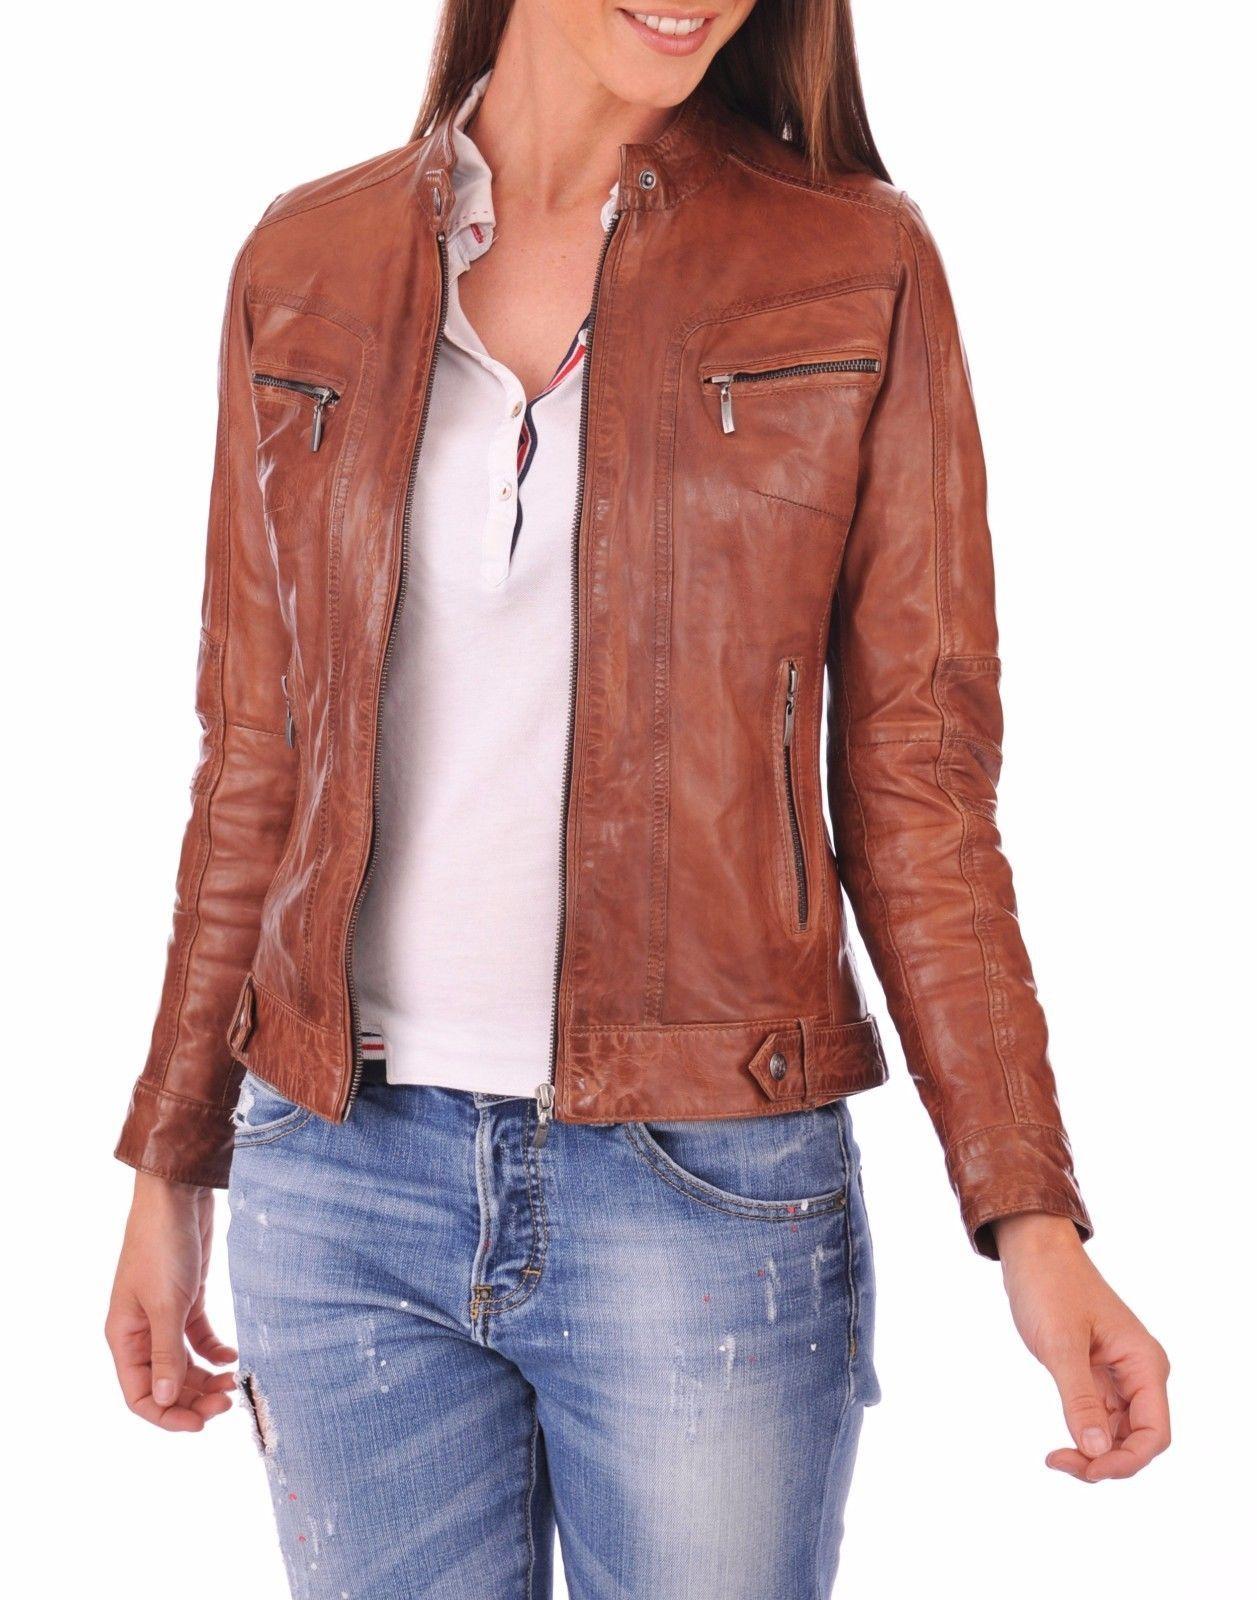 Details about New Vintage Women Slim Biker Motorcycle Soft